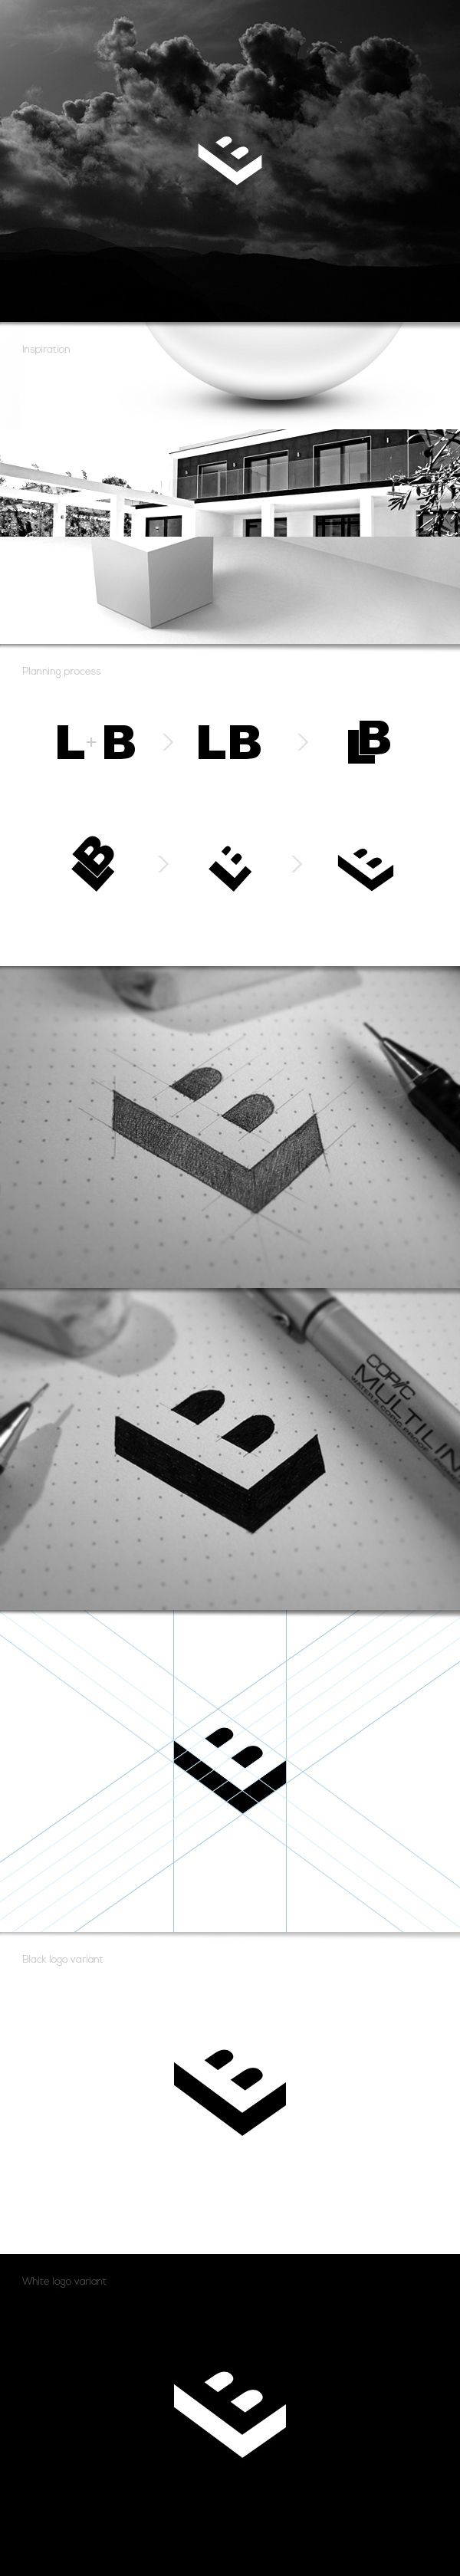 Béla Lajos || BL || LB || #logo #process #identity